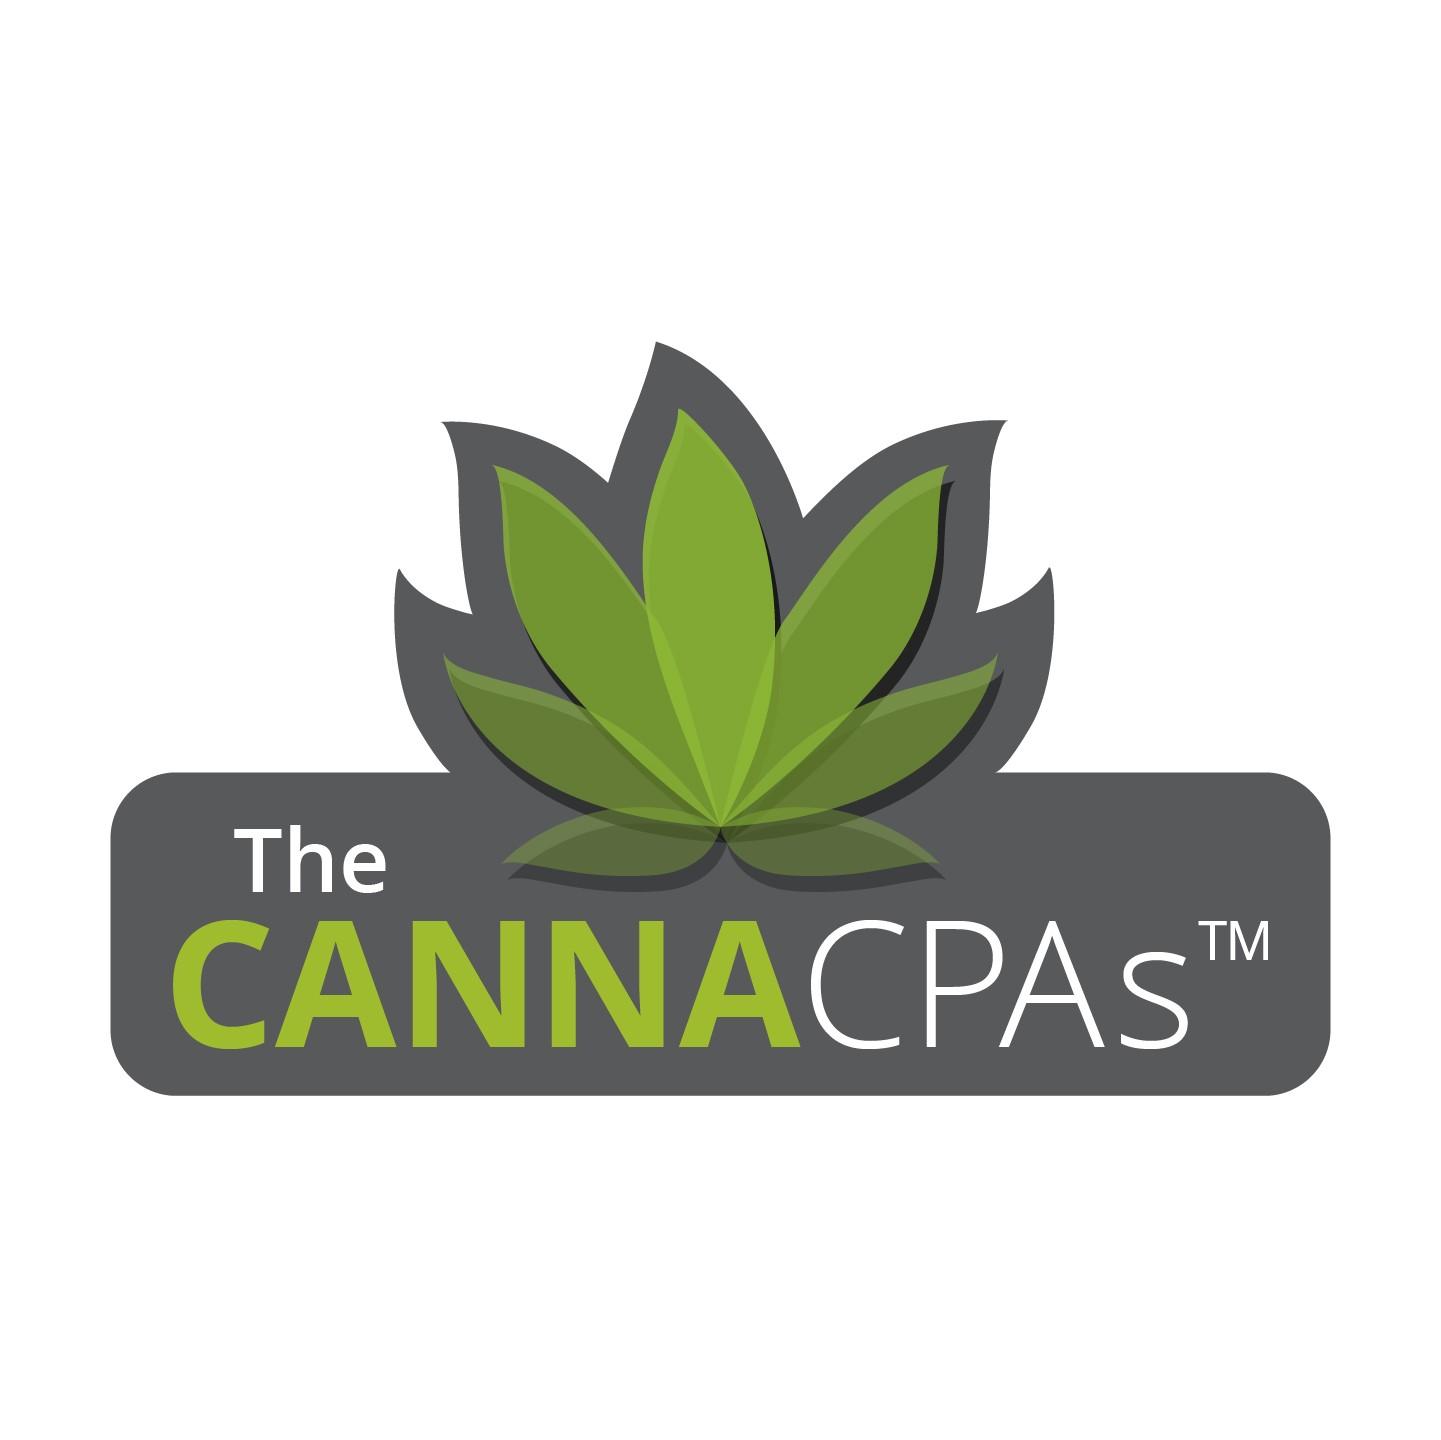 Logo for The Canna CPAs